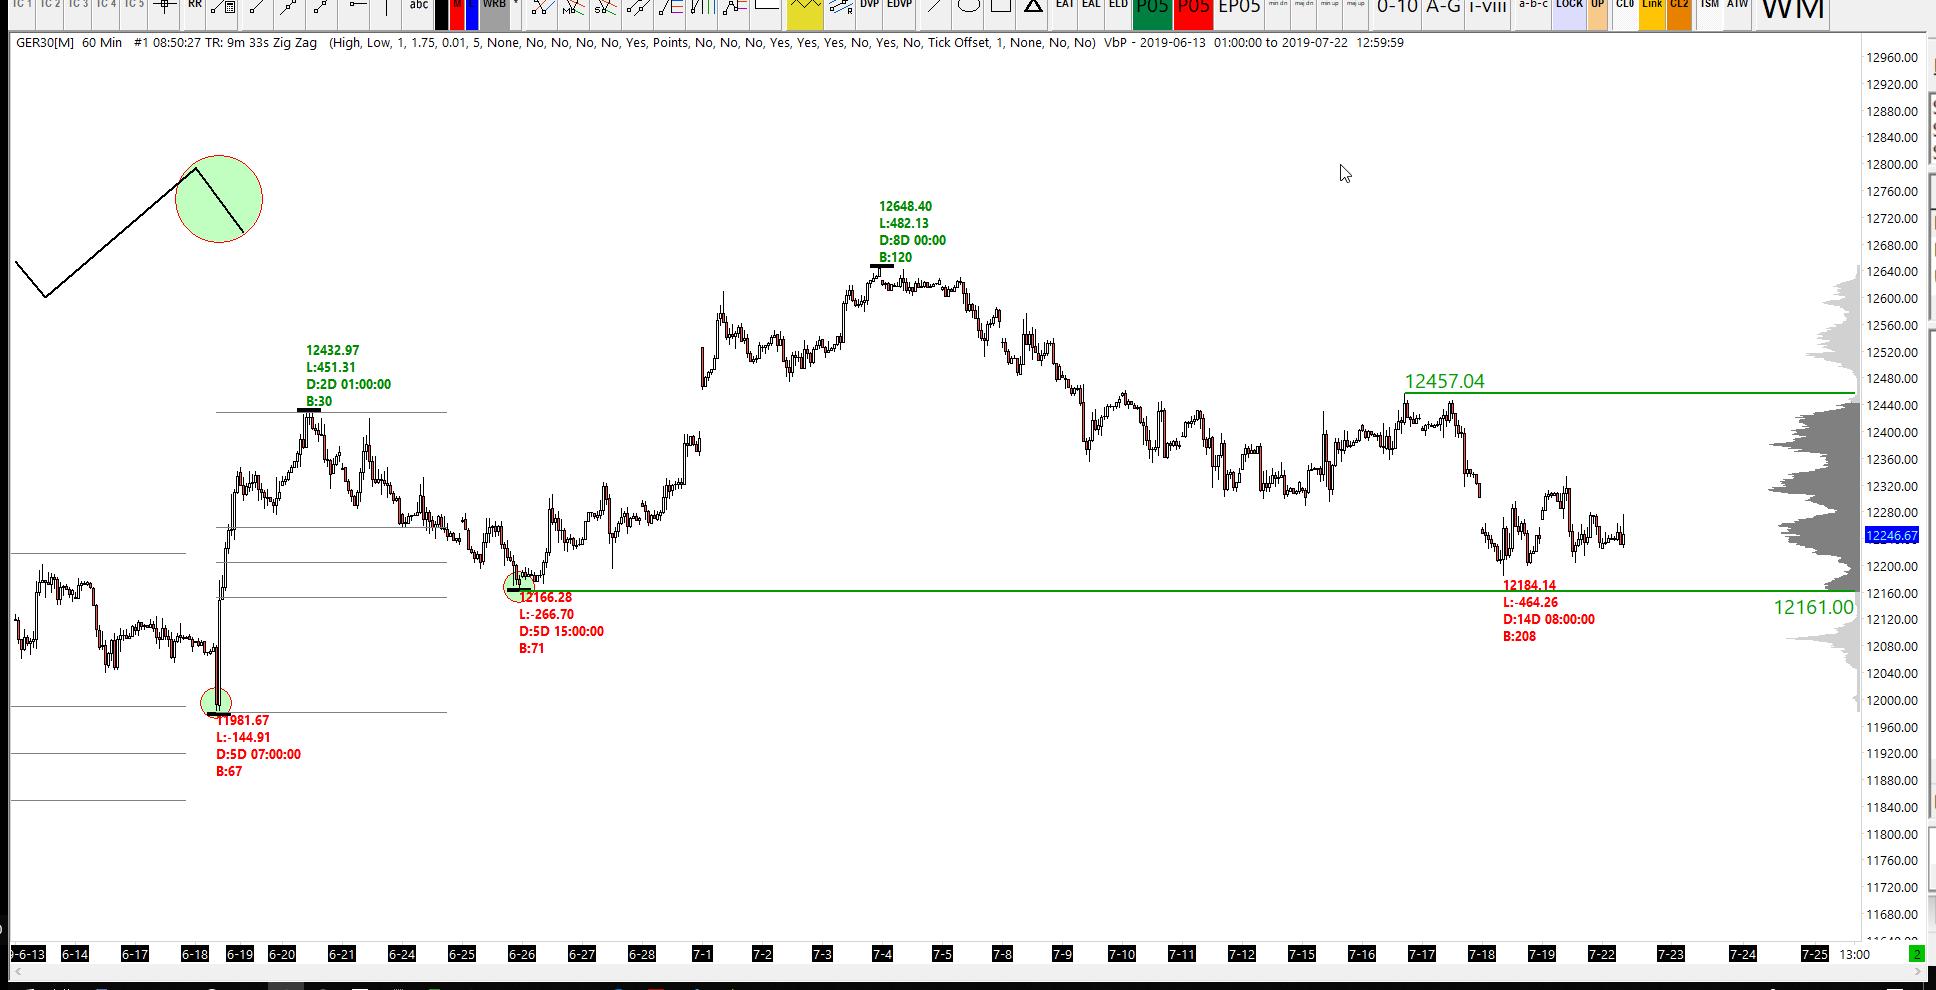 German DAX Analysis - Major Trend